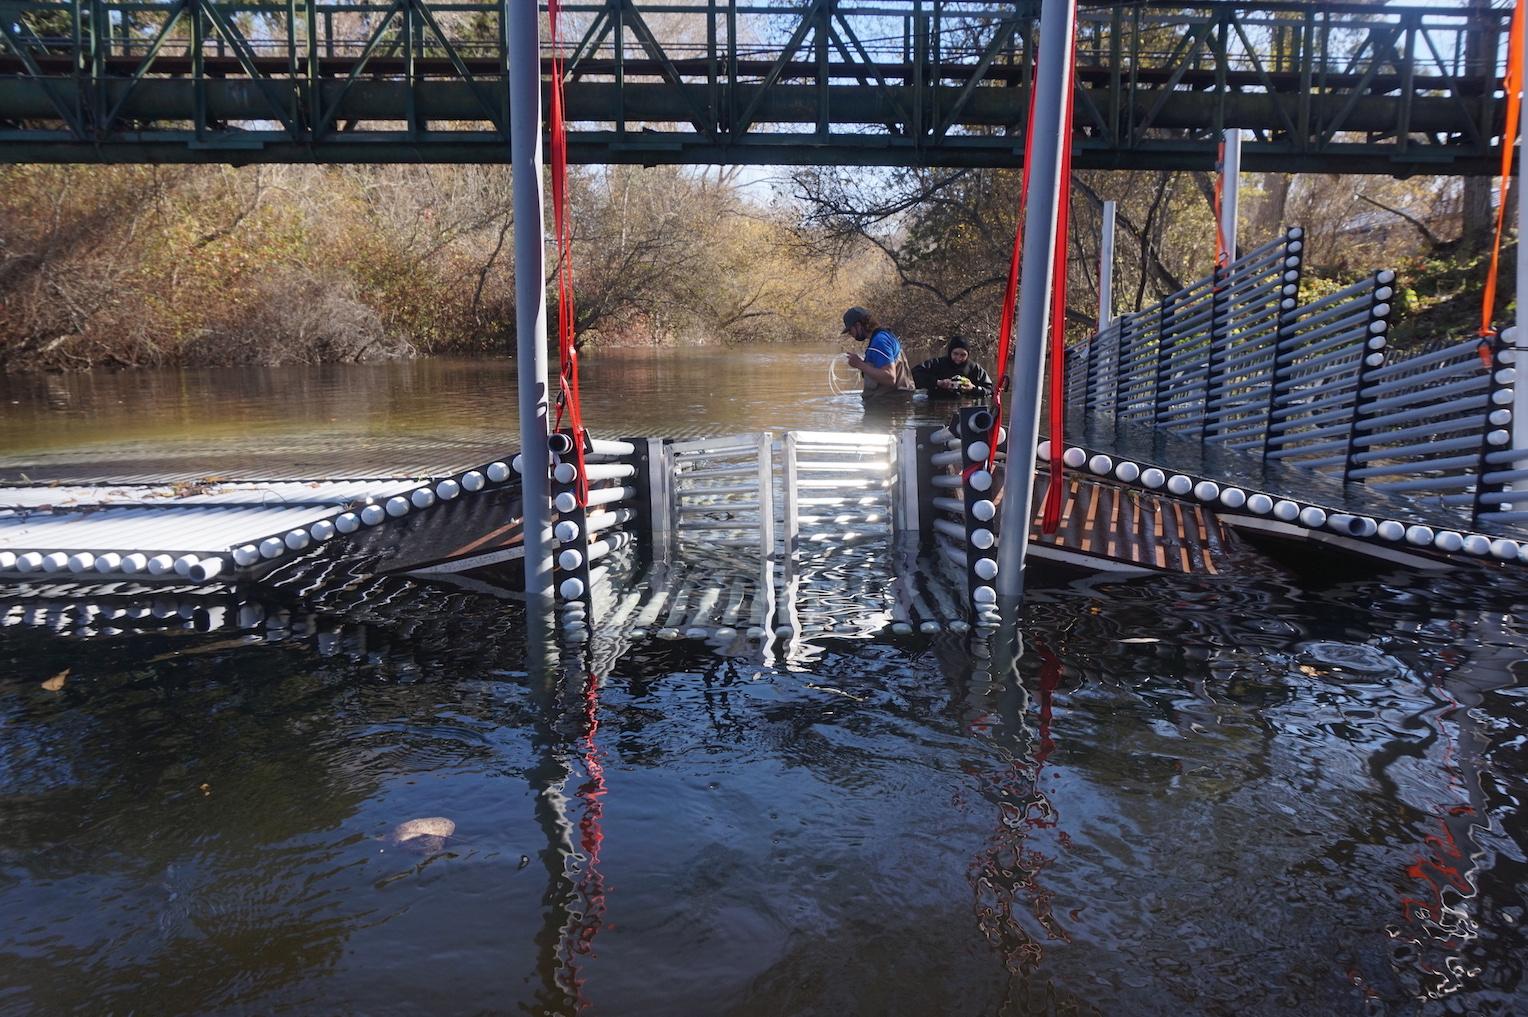 Passage structure for steelhead kelts on Carmel River weir